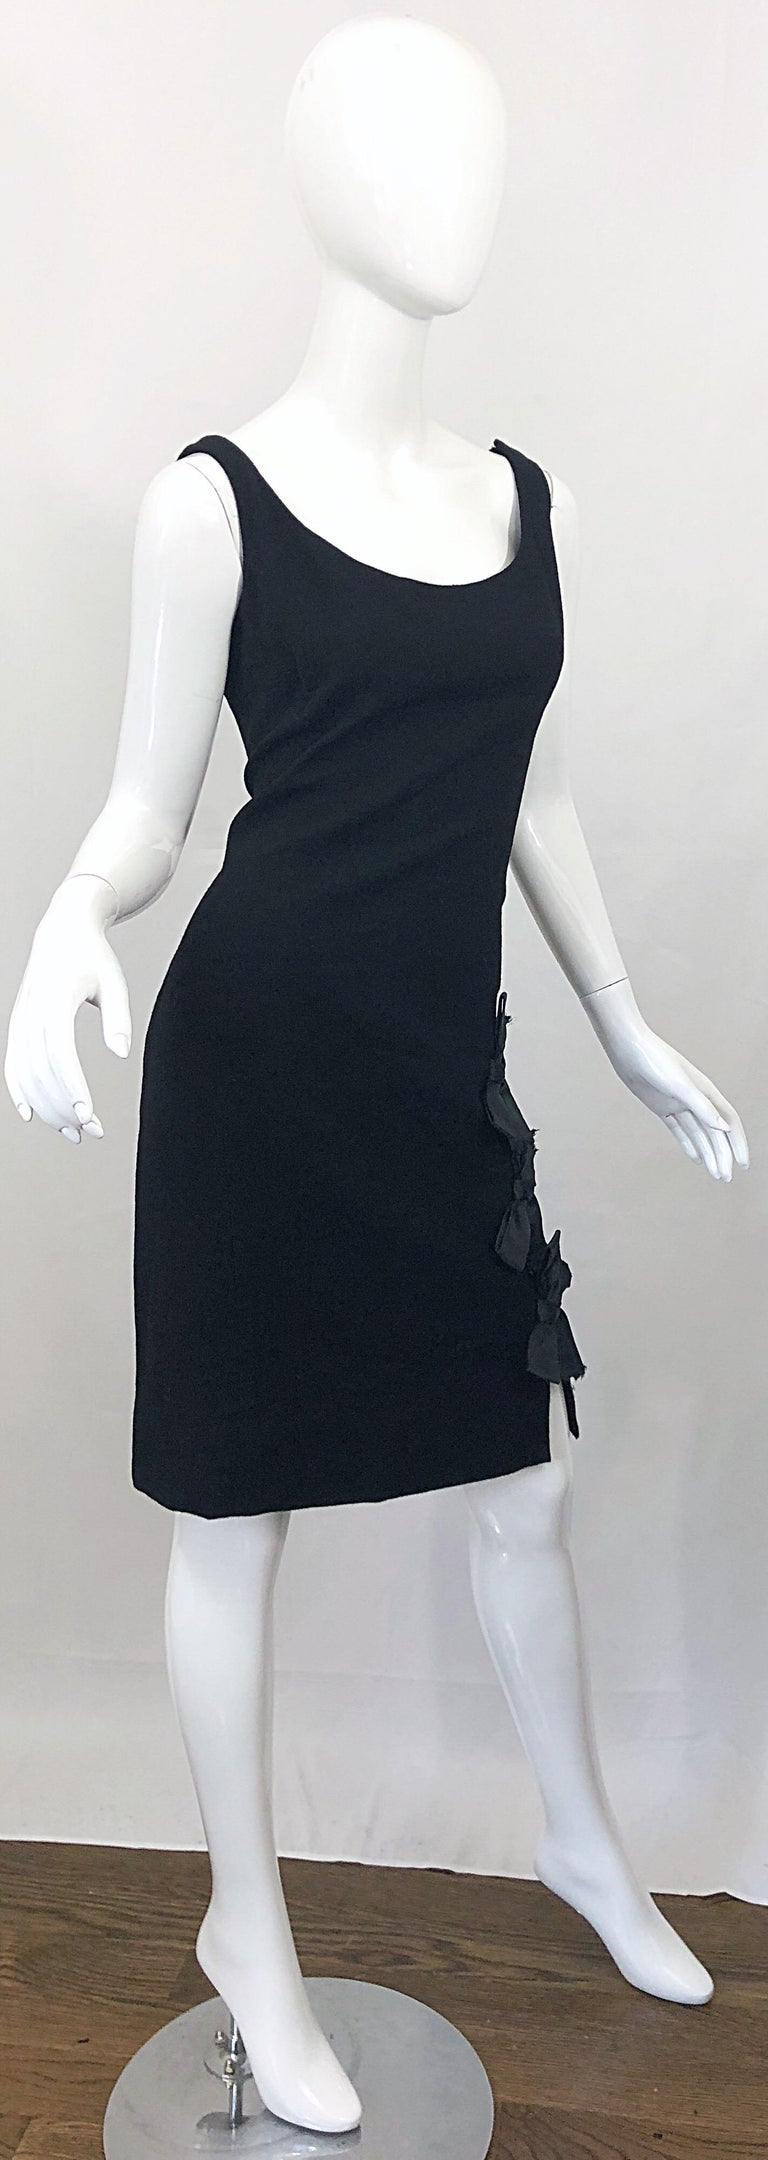 Geoffrey Beene 1960s Black Sleeveless Bow Detail Vintage 60s Wool Sheath Dress For Sale 2